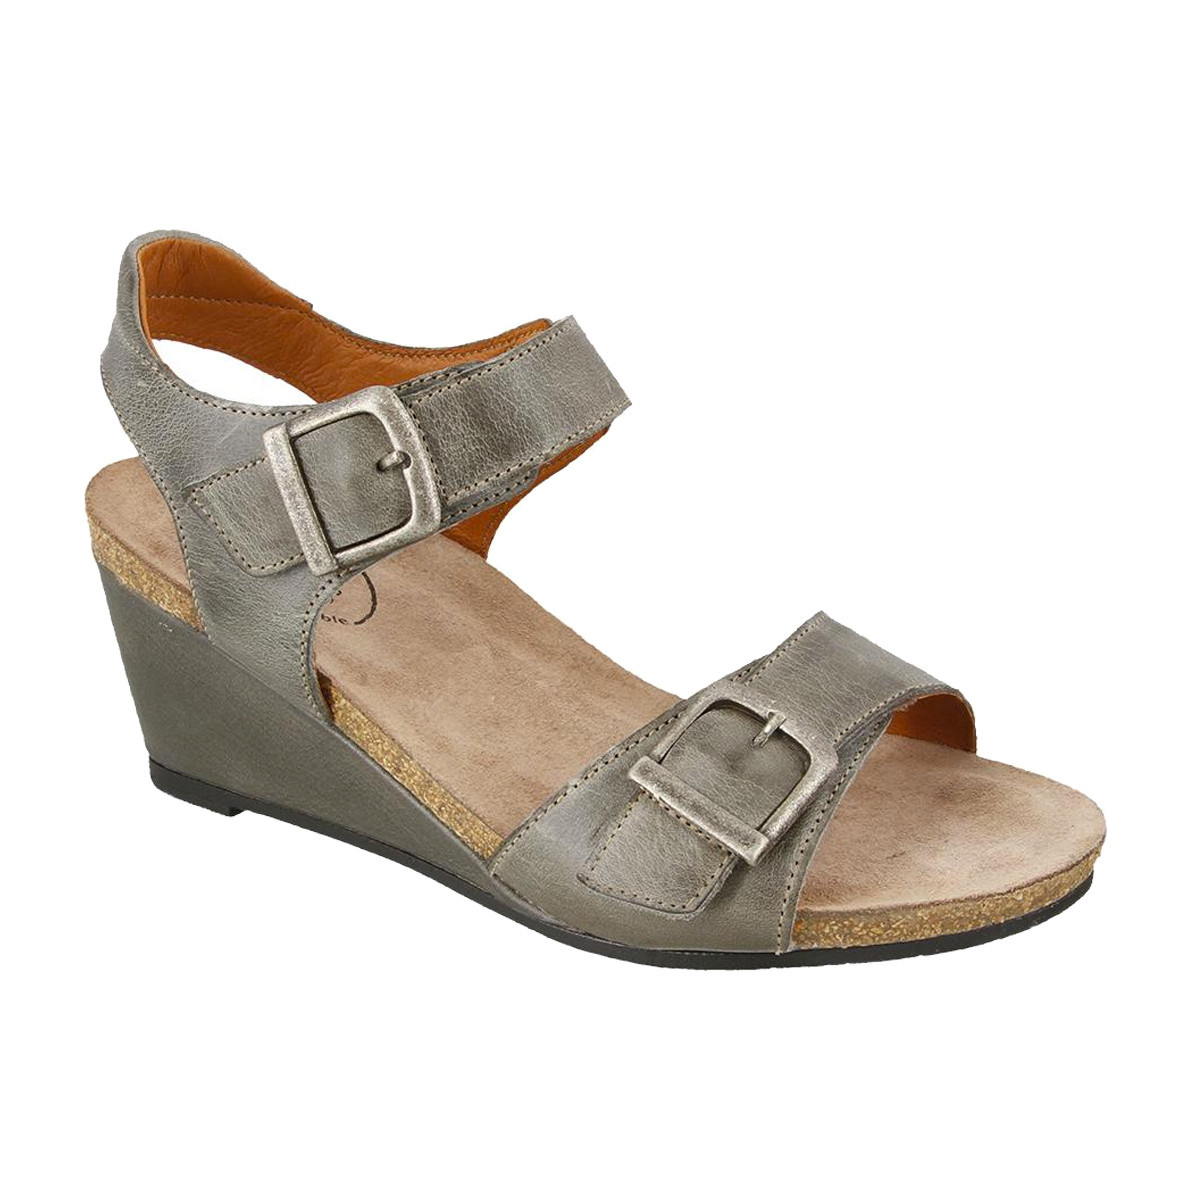 Taos Footwear Taos Women's Buckle Up Graphite